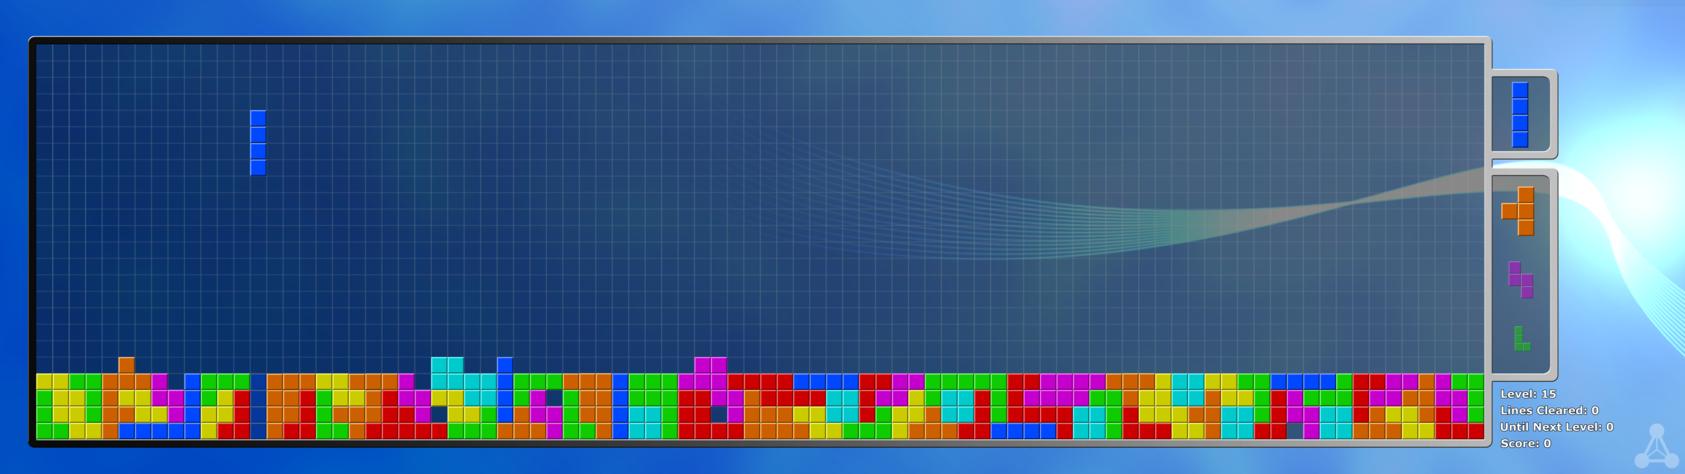 Free download Zero Points Tetris Dual Monitor Wallpaper by